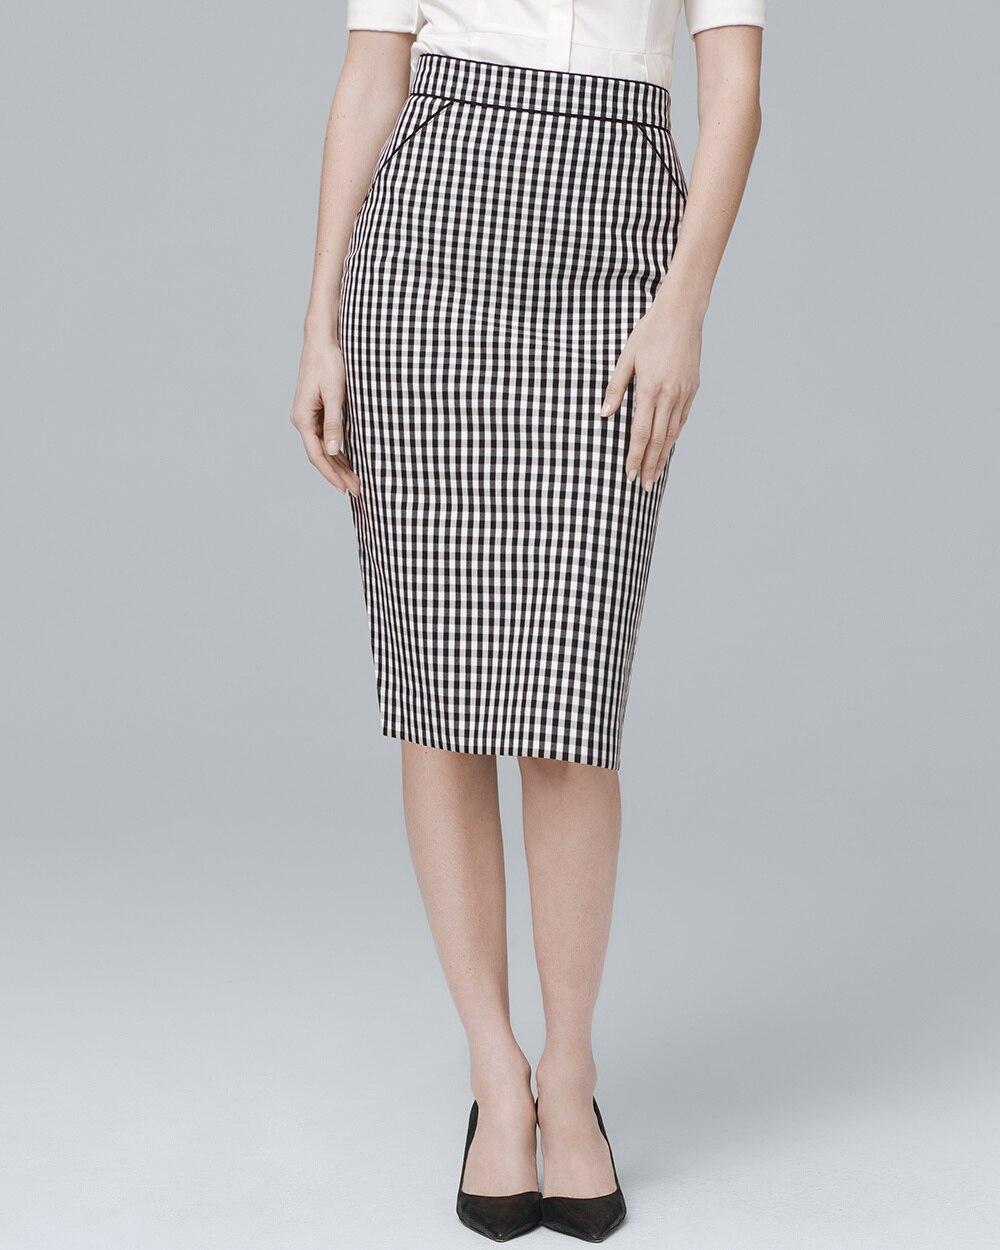 70f568267a1 Gingham Pencil Skirt - White House Black Market